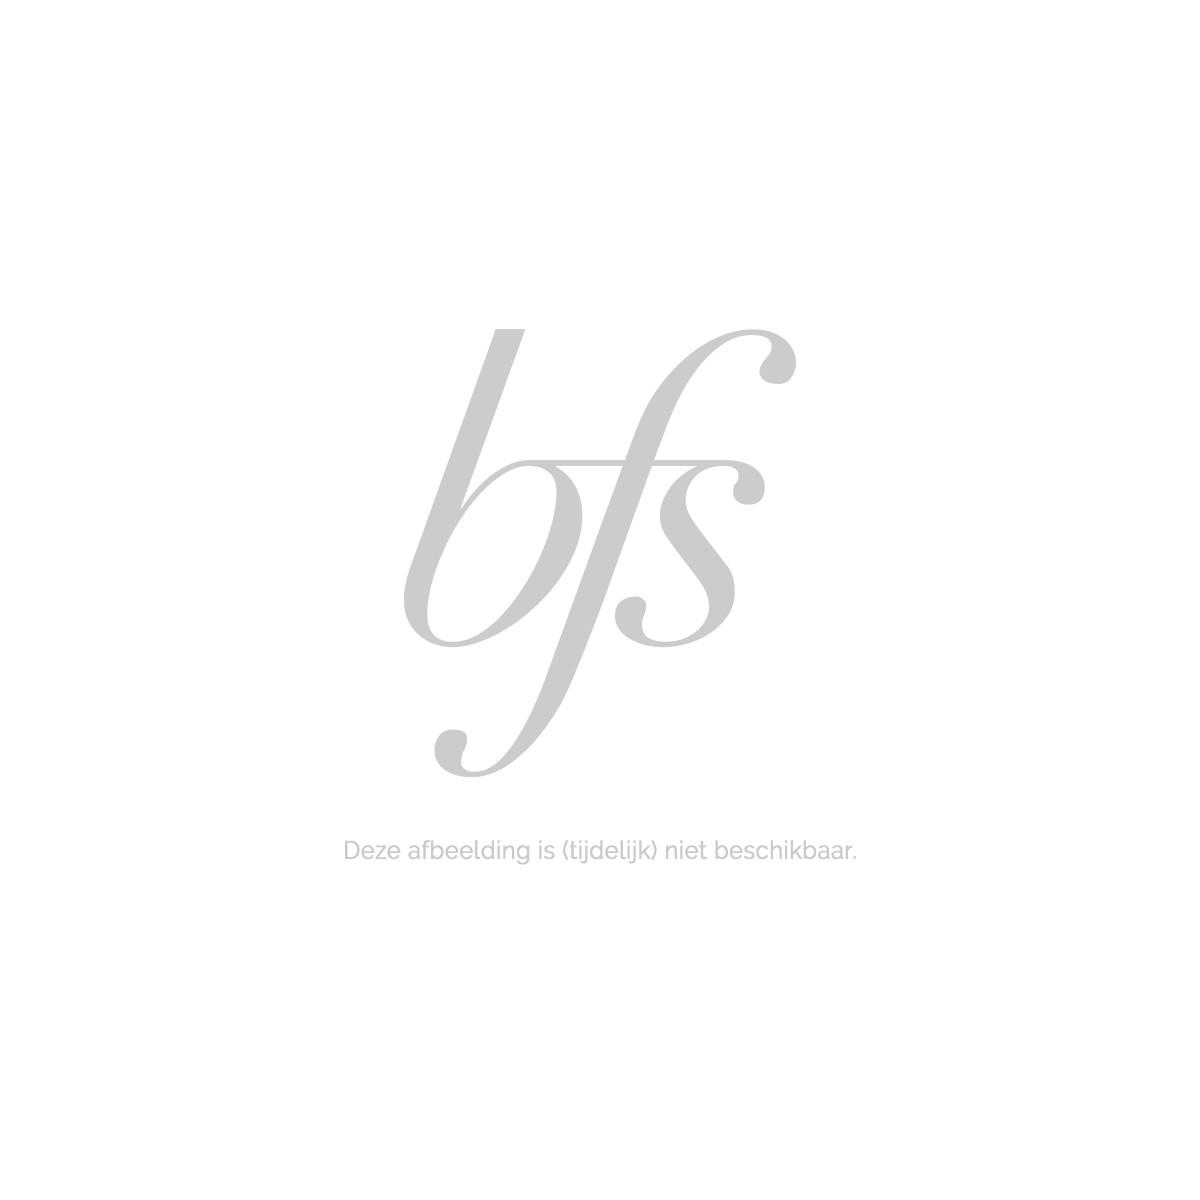 Sensai Cp Cream Foundation Spf15 #Cf13 Warm Beige 30 Ml